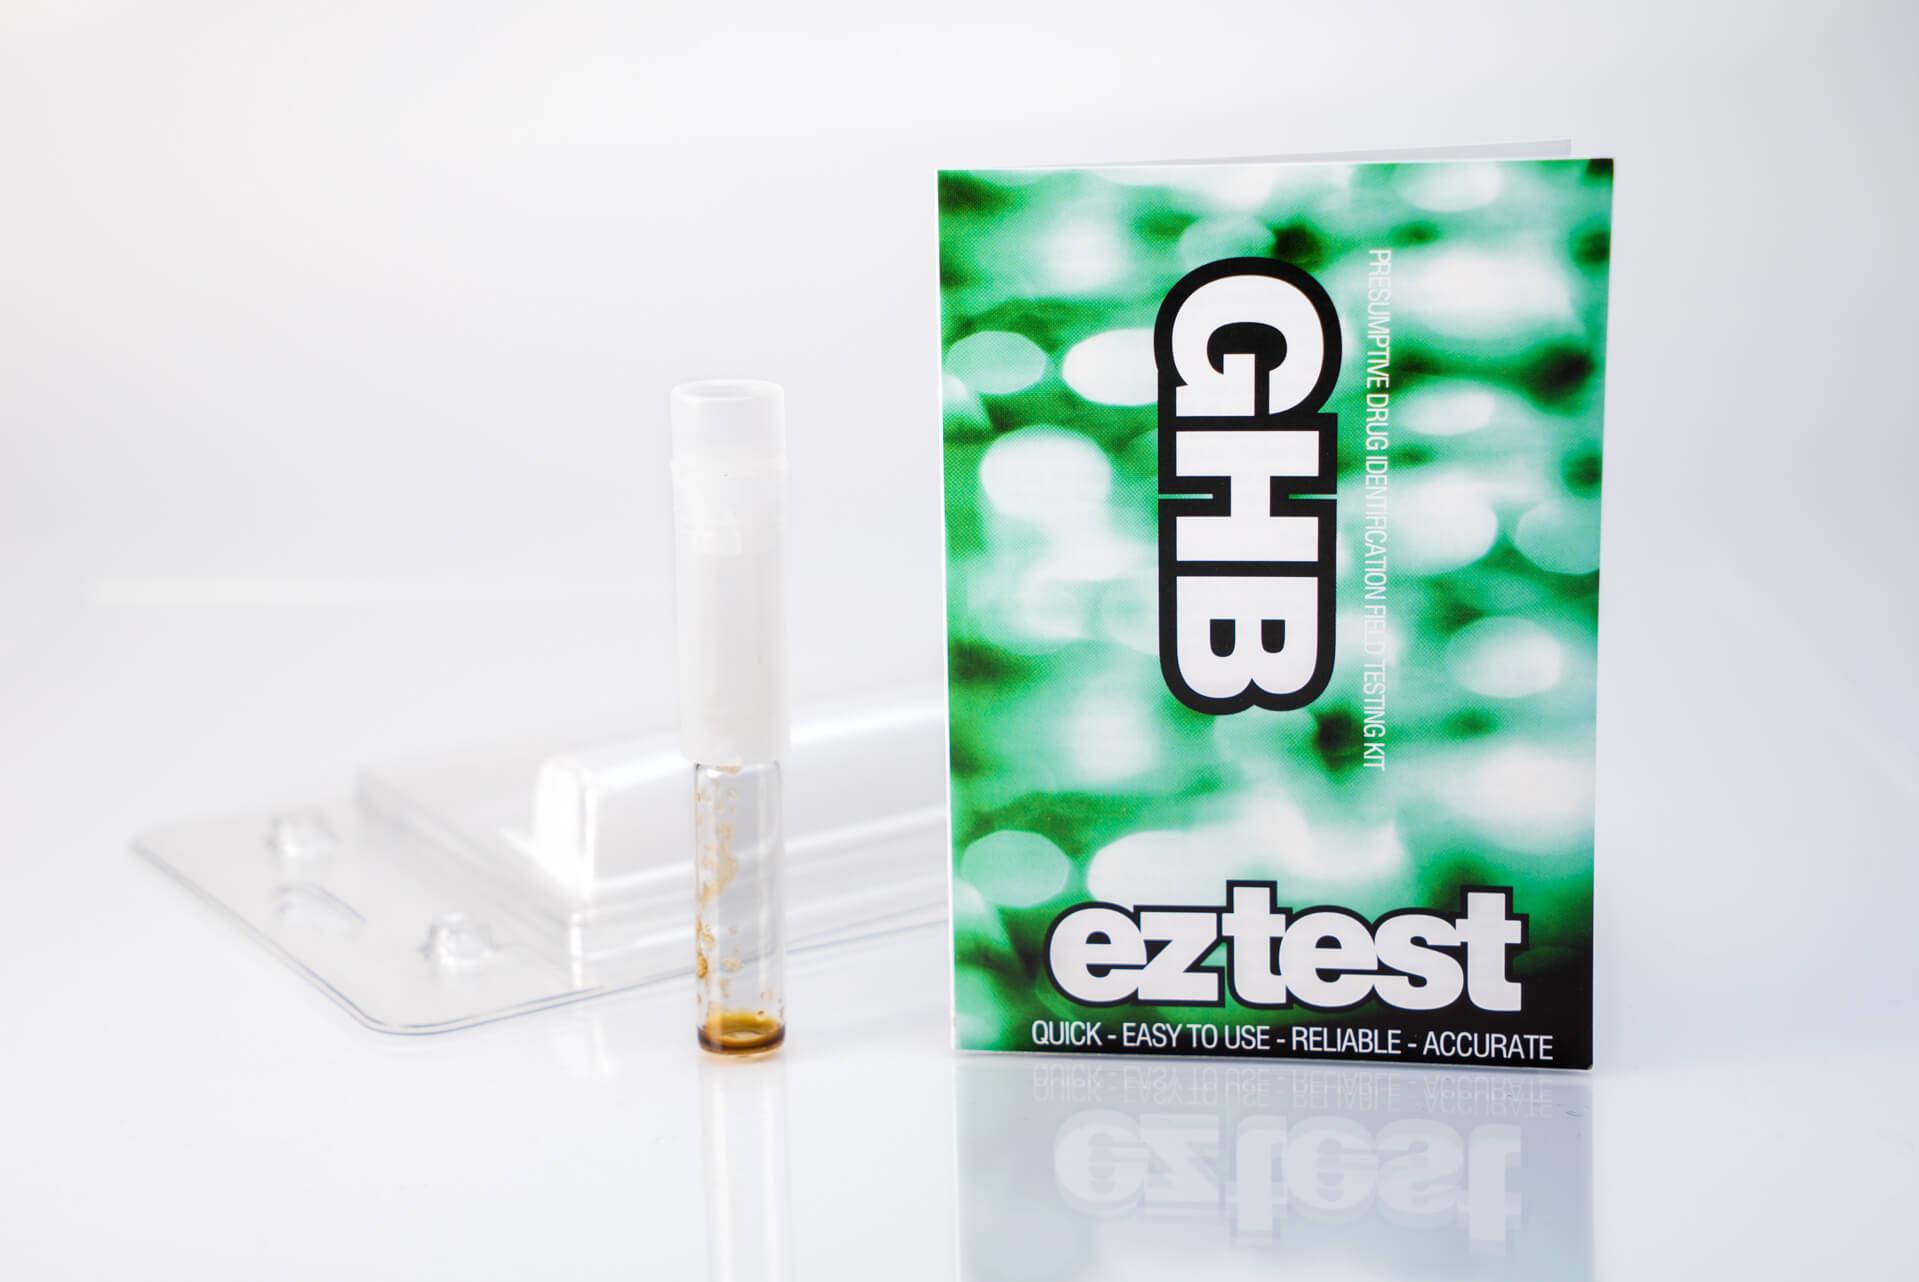 Einweg-GHB-Drogen-Test-Kit